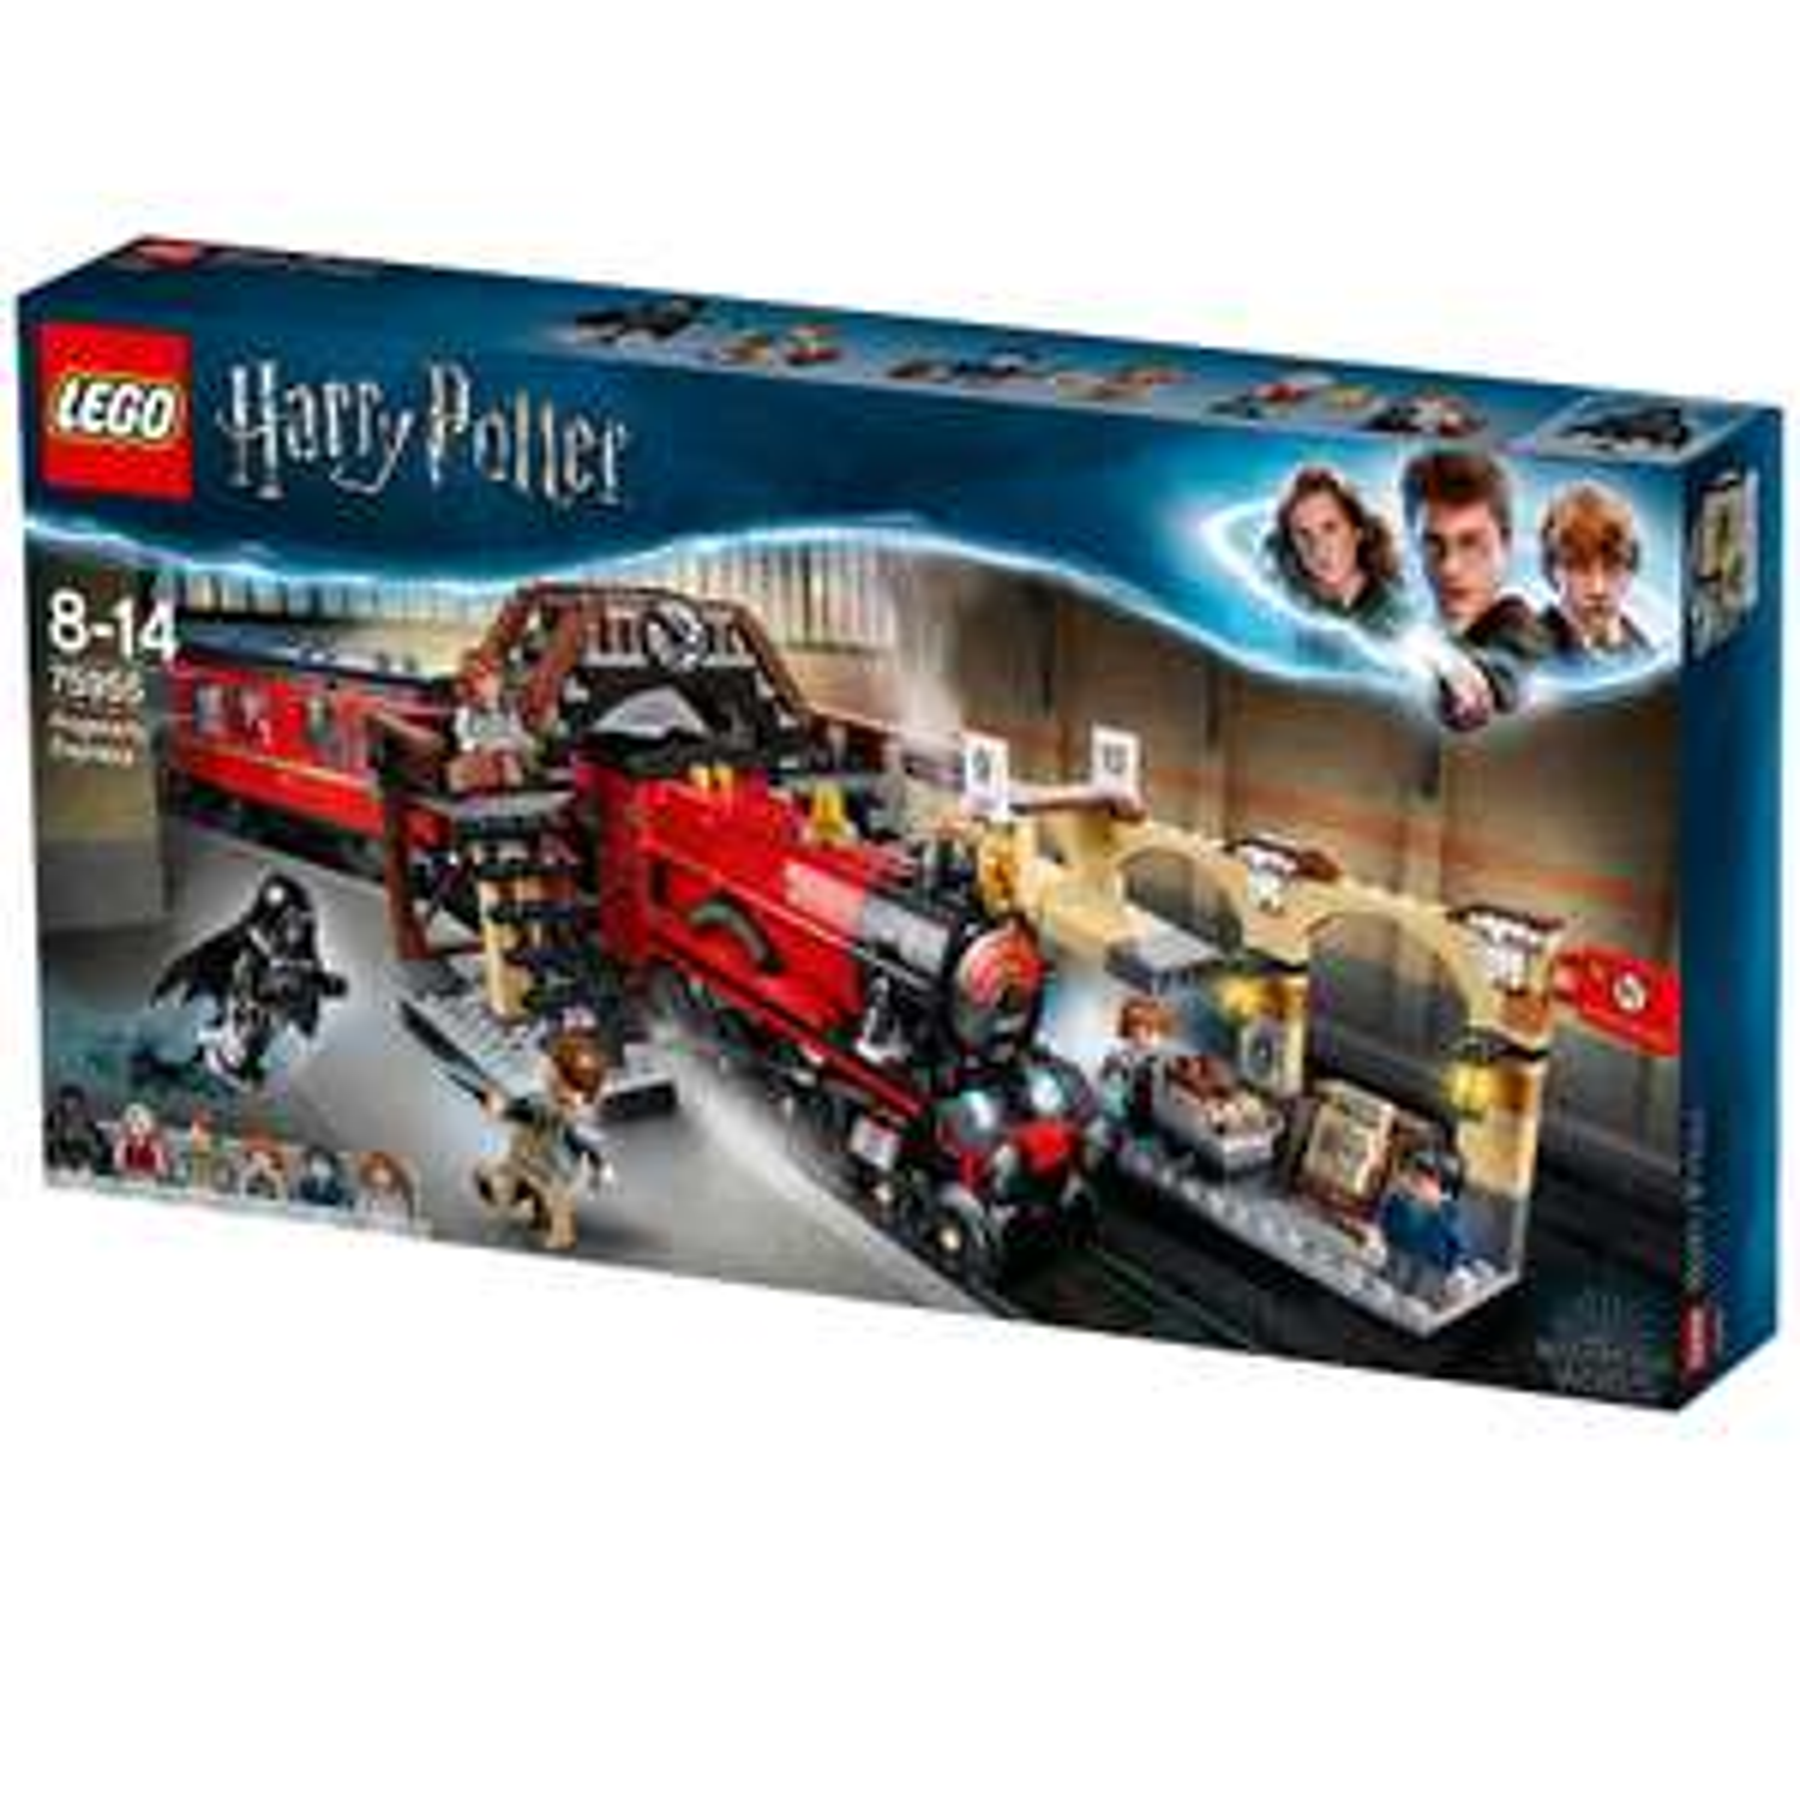 LEGO Hogwarts Express 75955 - £51.97 @ George ASDA - Free C&C & 5%TCB